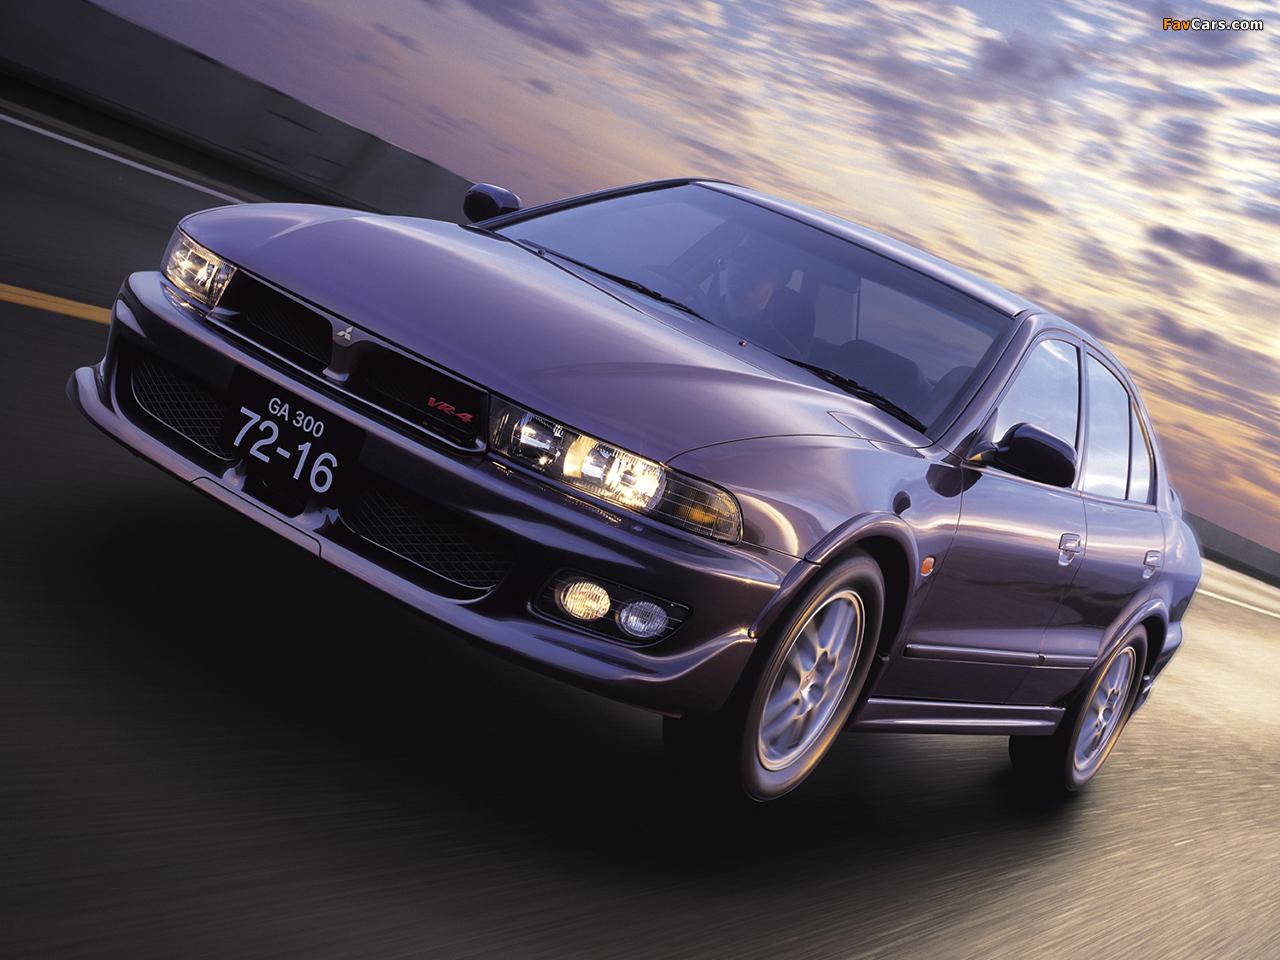 Free Download Wallpapers Of Mitsubishi Galant Vr 4 Viii